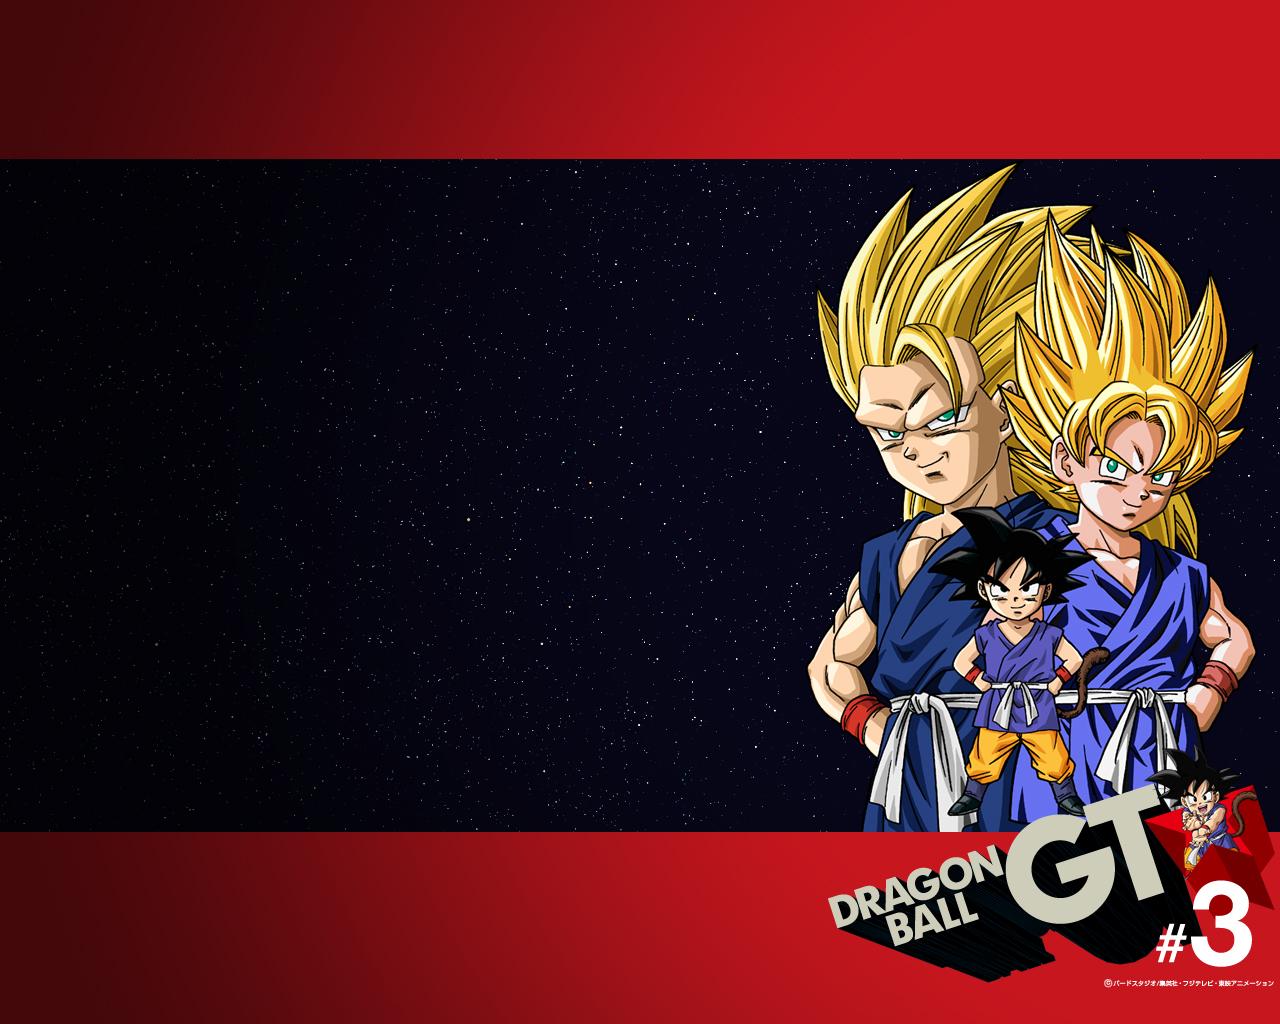 http://4.bp.blogspot.com/-qMQpDMk31rc/TsxrEpcqJuI/AAAAAAAAAm4/FJtkapAFFL0/s1600/dragn-ball-gt-goku-chibi-wallpaper-anime-manga-o-f-ibackgroundz.com.jpg